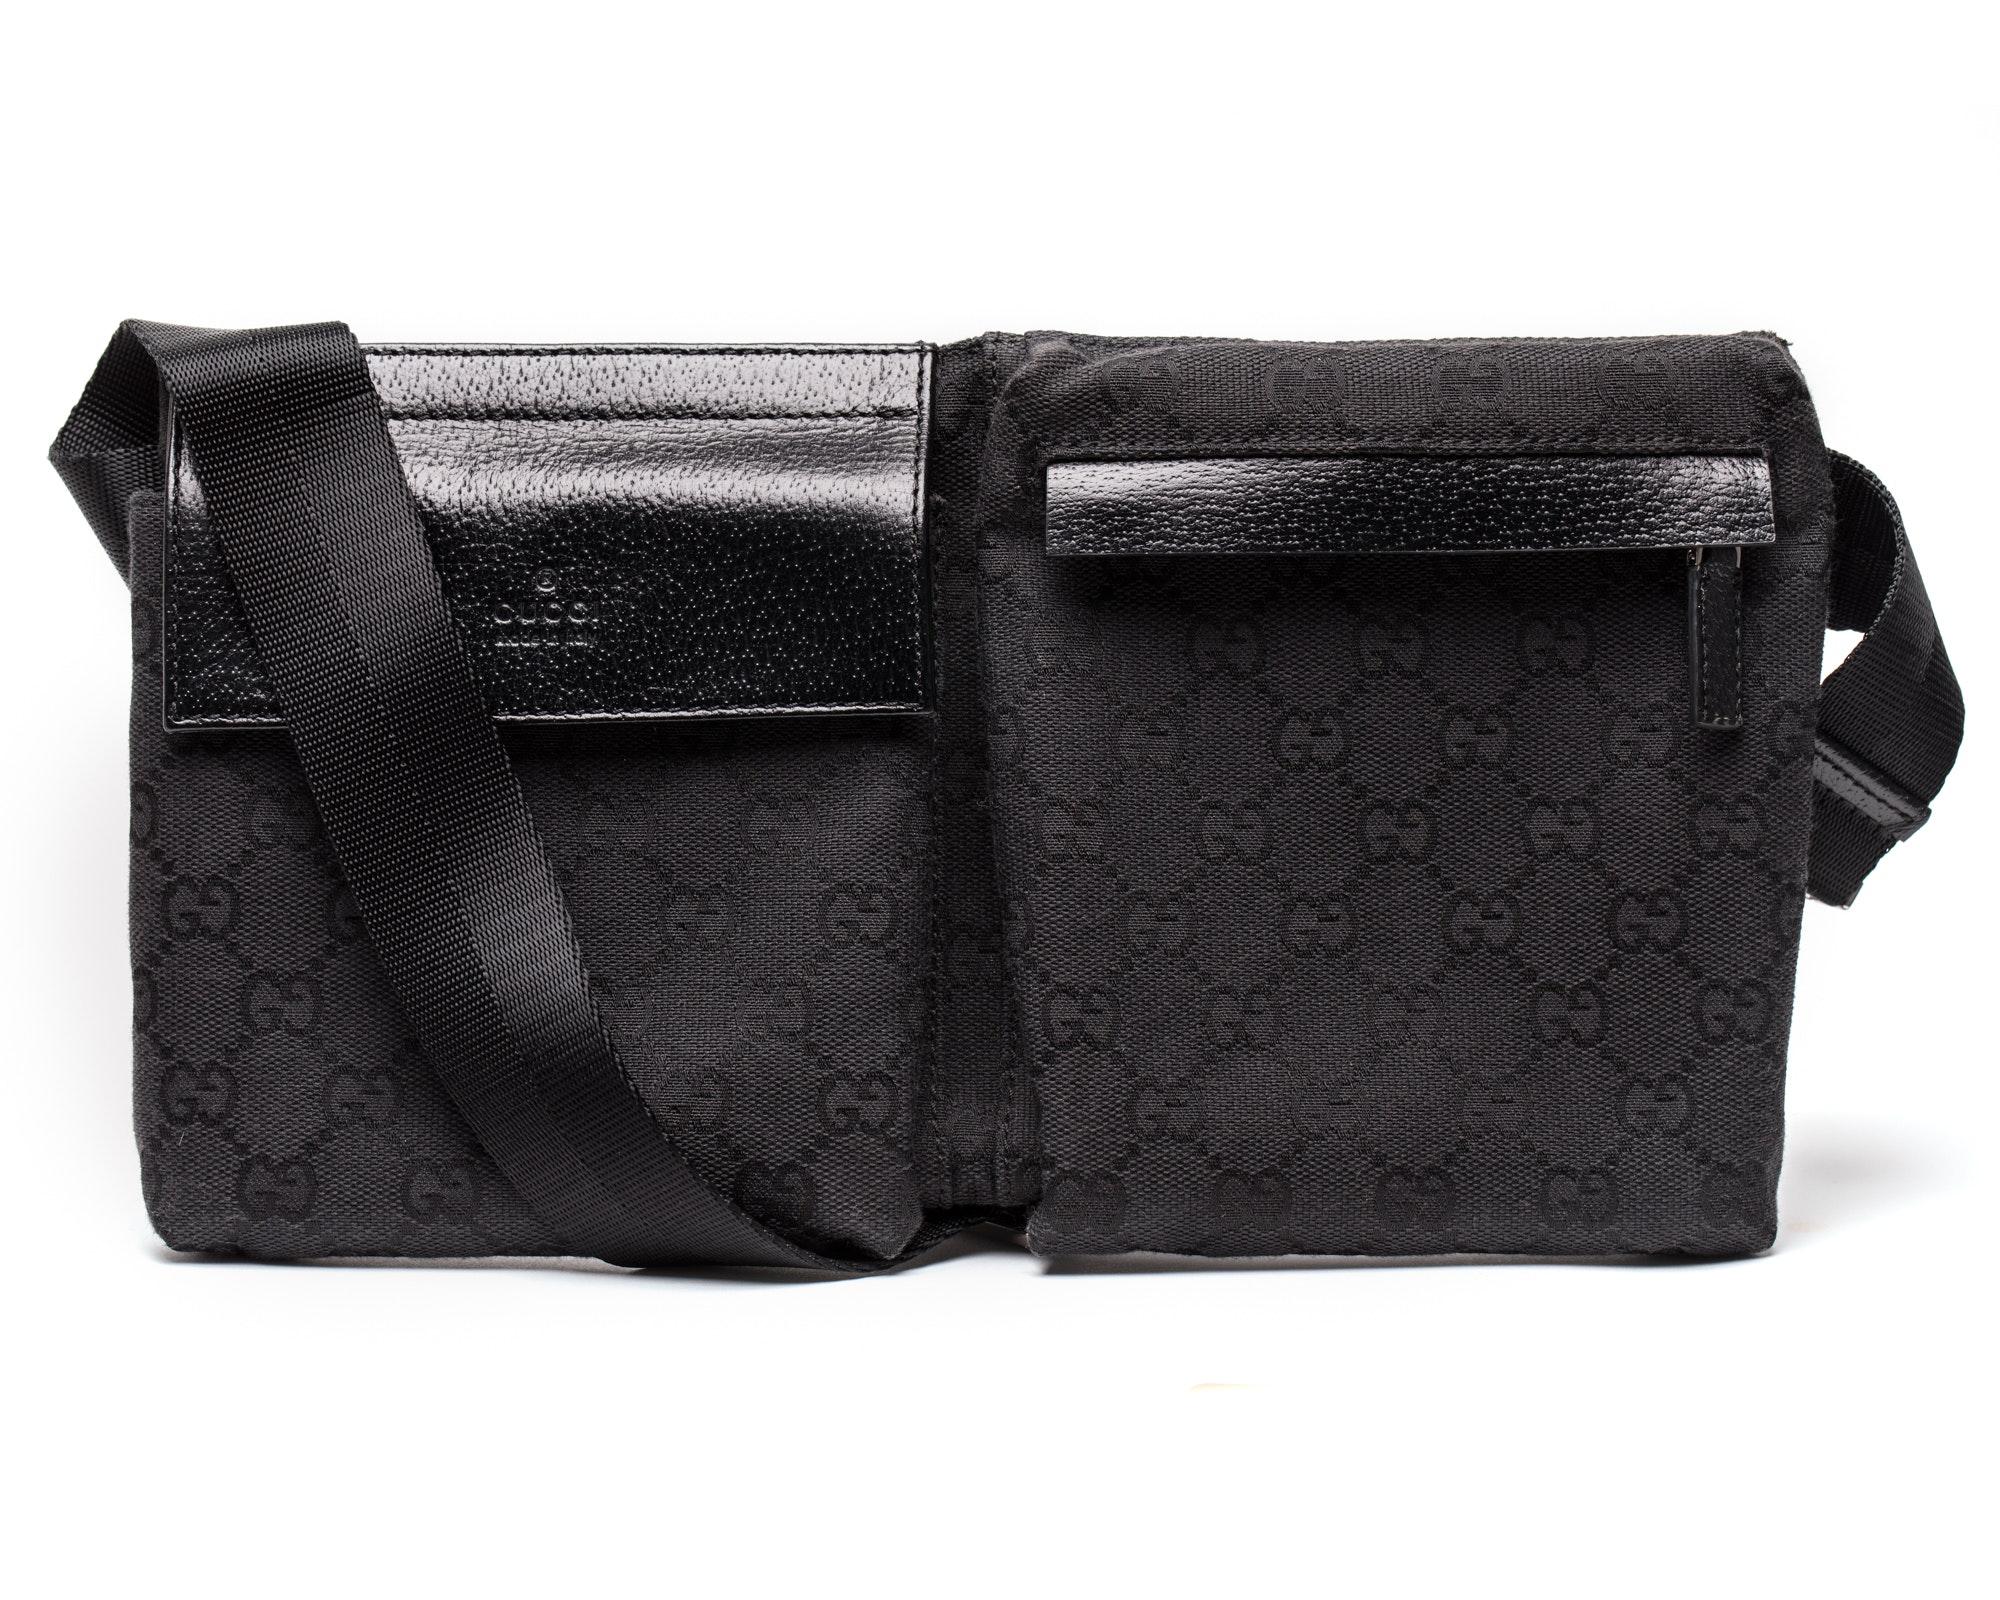 Gucci Flap Waist Bag GG Monogram Dark Brown